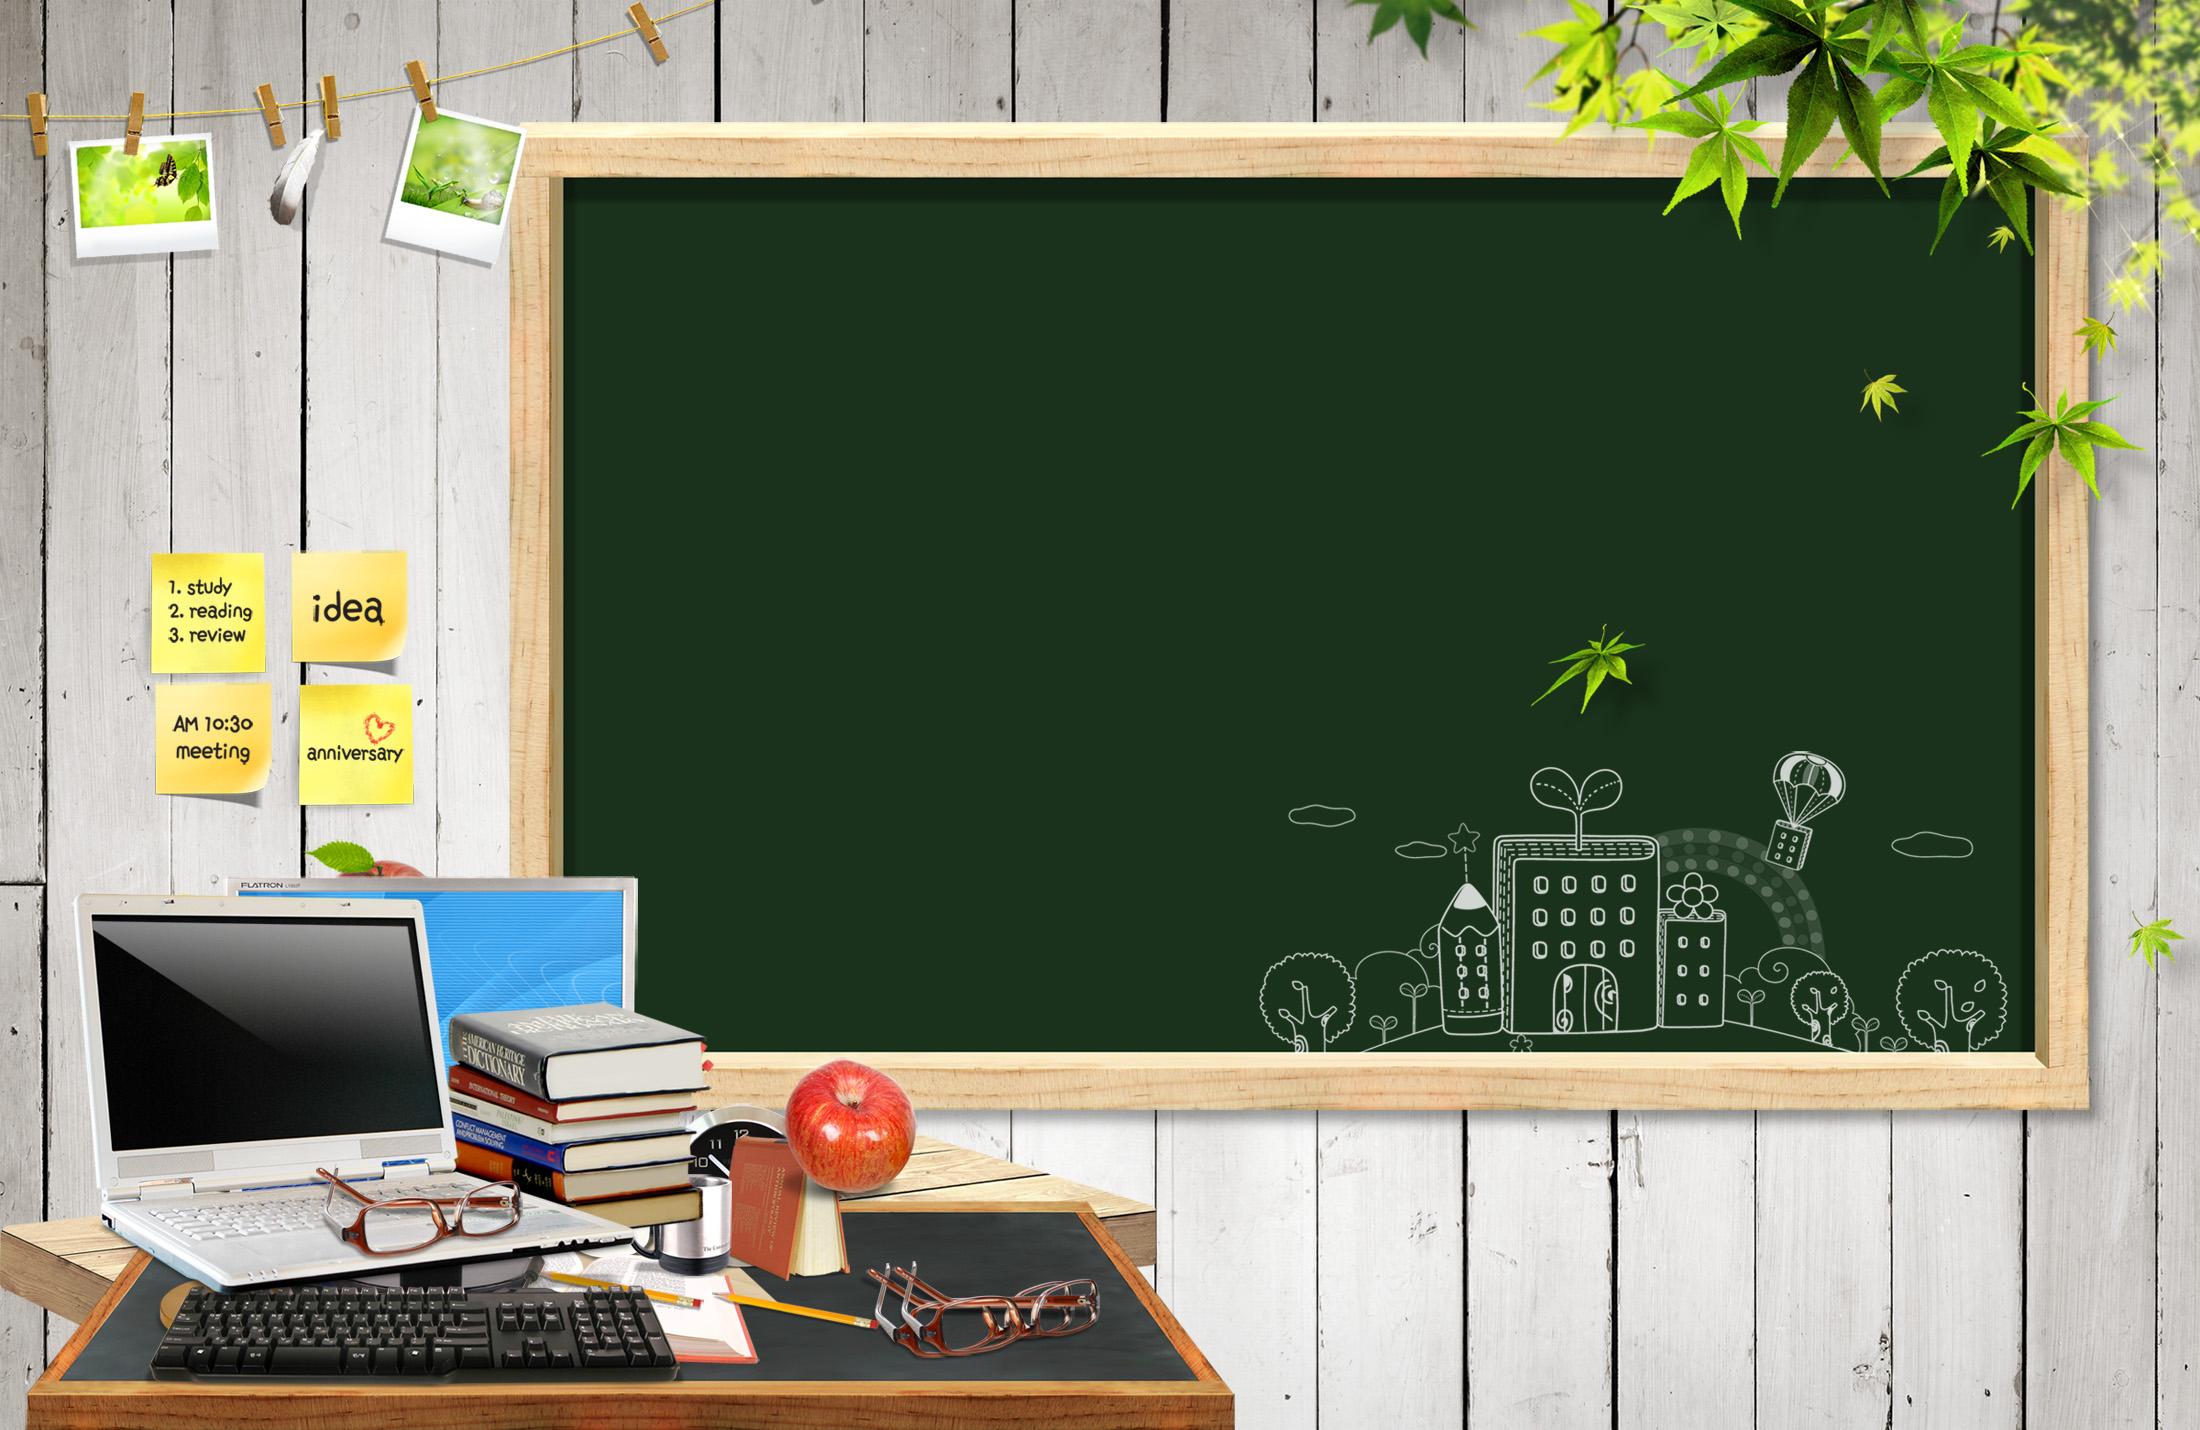 Classroom Wallpaper for Computer - WallpaperSafari